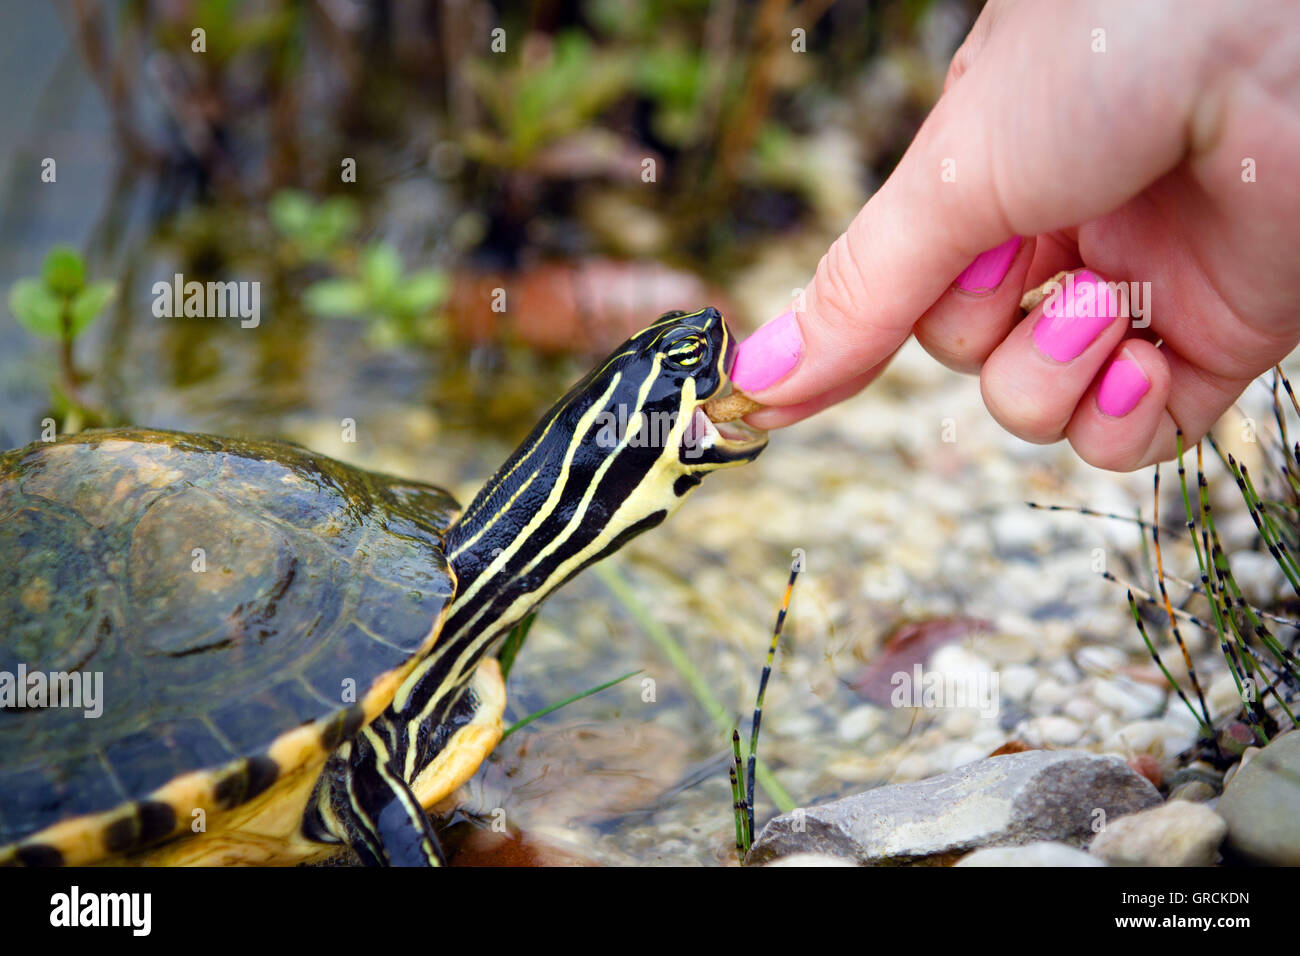 Turtles Feeding - Stock Image